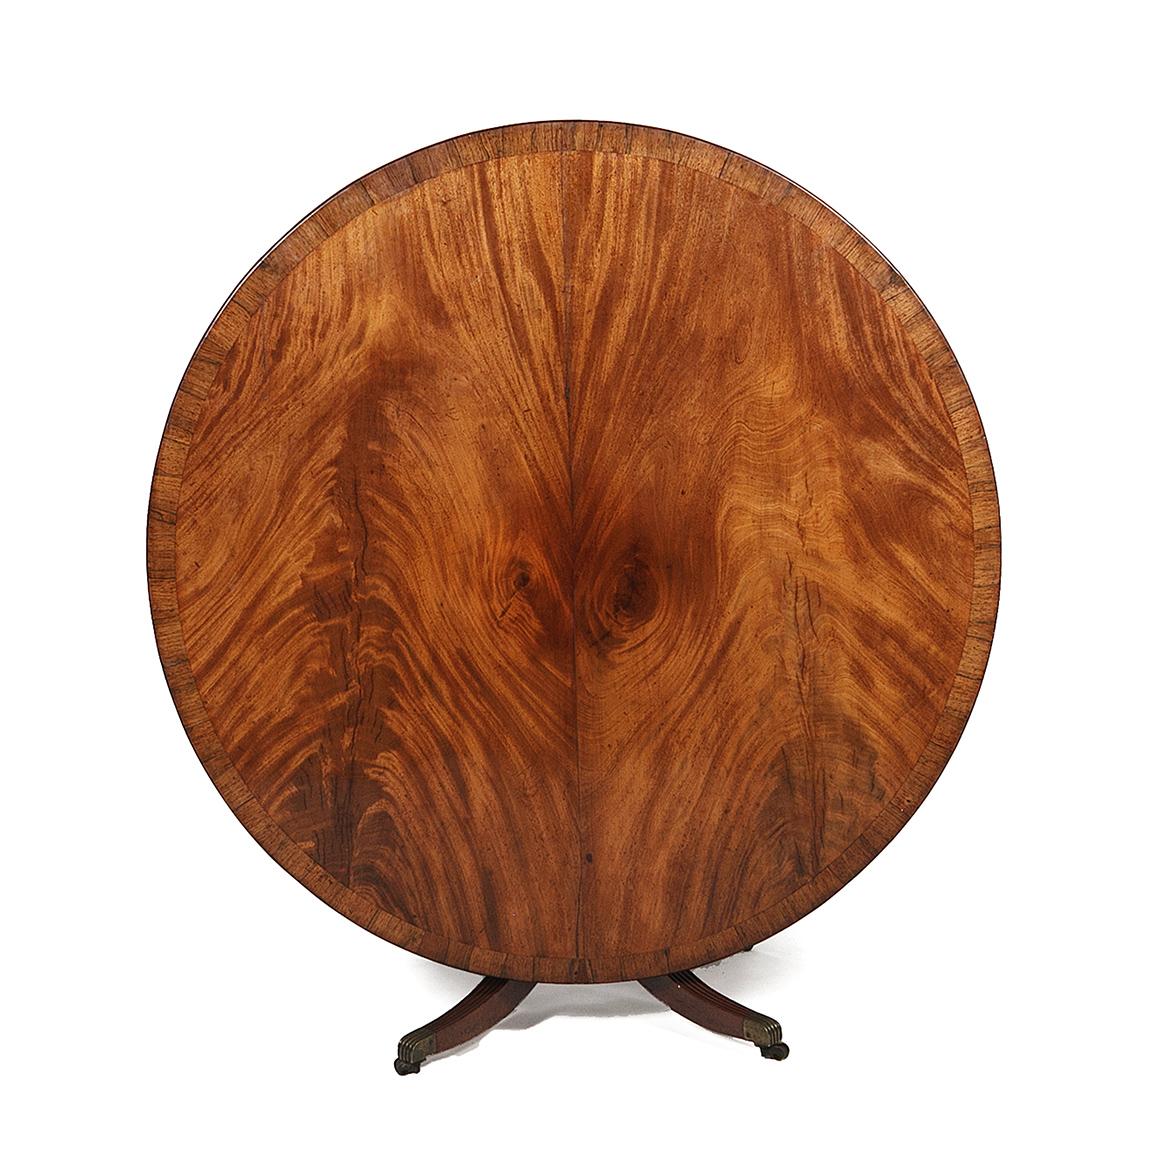 3021 Circular Regency Mahogany Pedestal Dining Table O